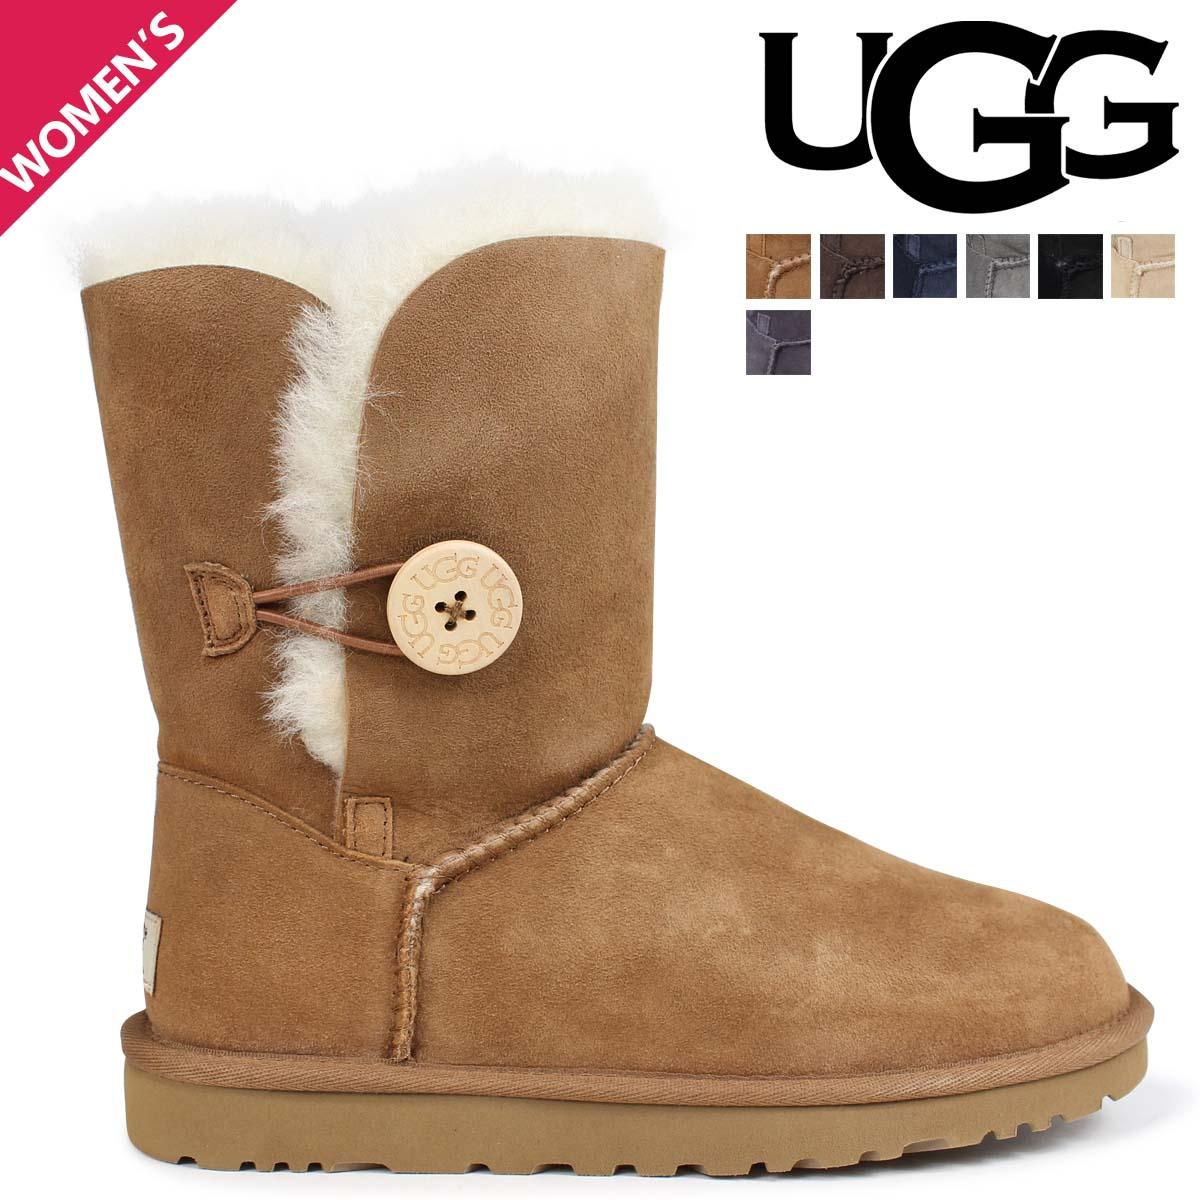 a19fd7bbe7e アグ UGG boots mouton boots Bailey button 2 Lady's Bailey button 2 5803  1016226 WOMENS BAILEY BUTTON II